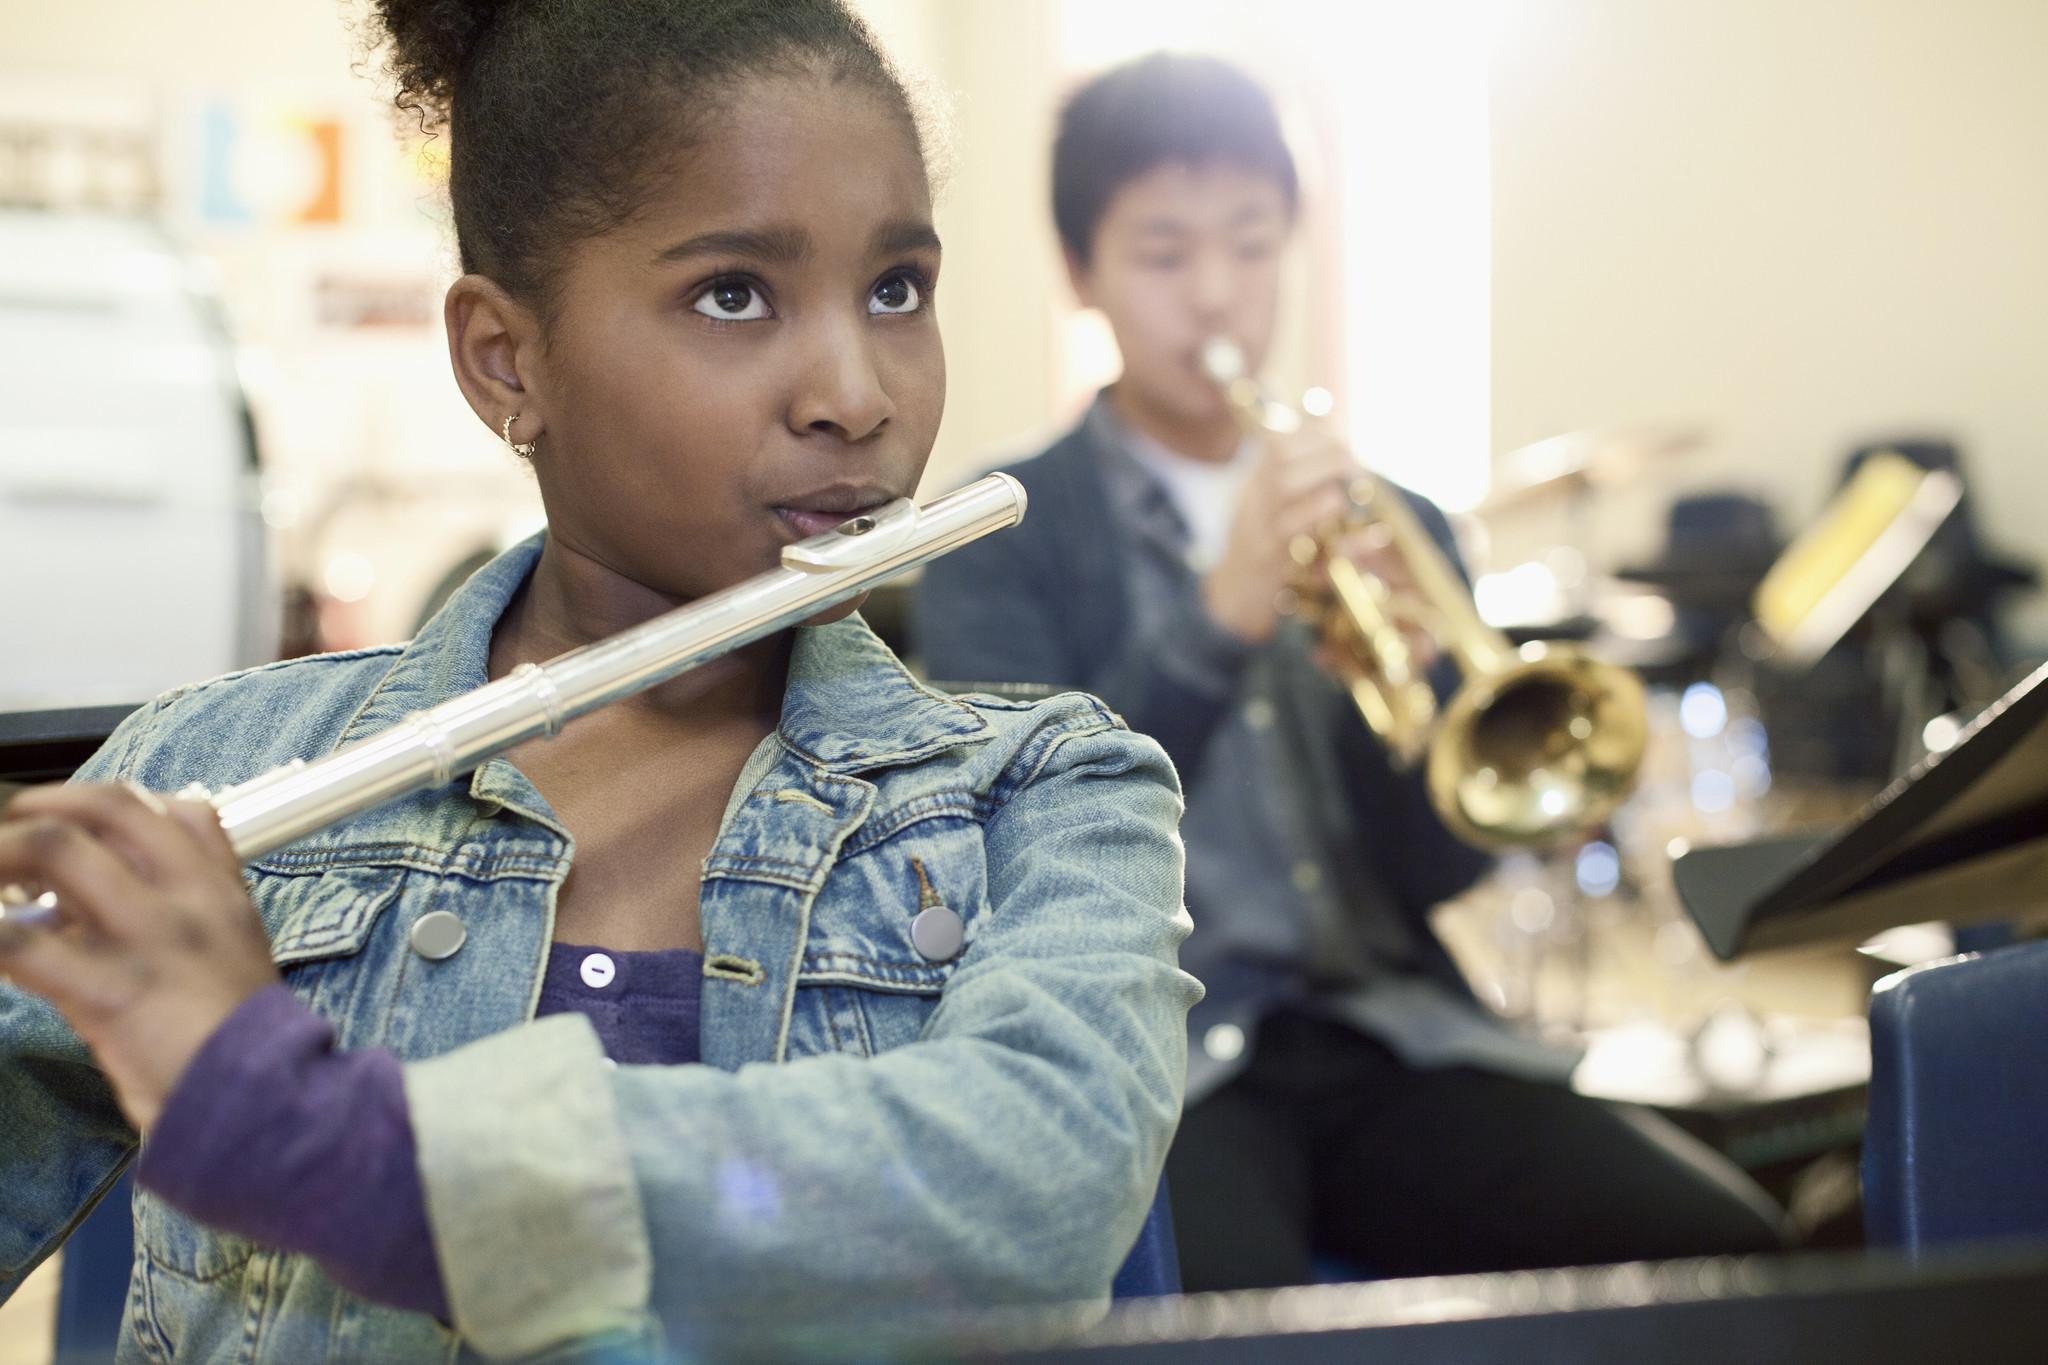 NYC school arts spending up $14 million over last year: report